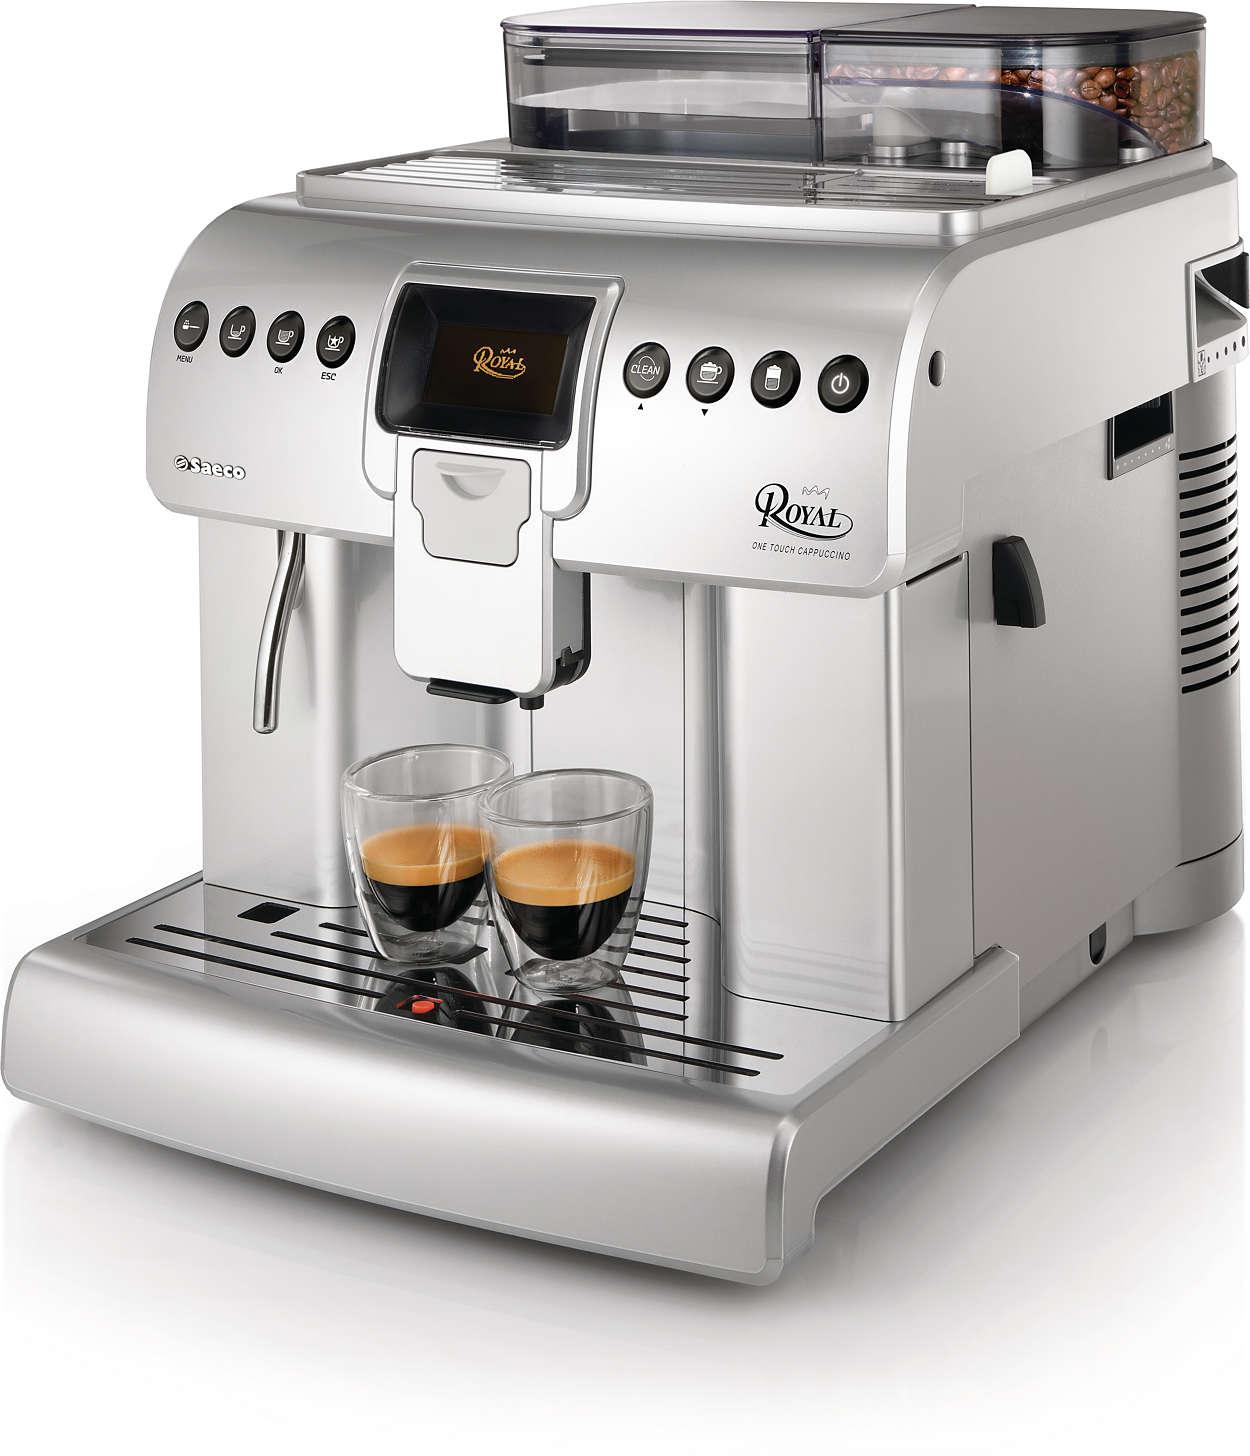 royal super automatic espresso machine hd8930 04 saeco. Black Bedroom Furniture Sets. Home Design Ideas